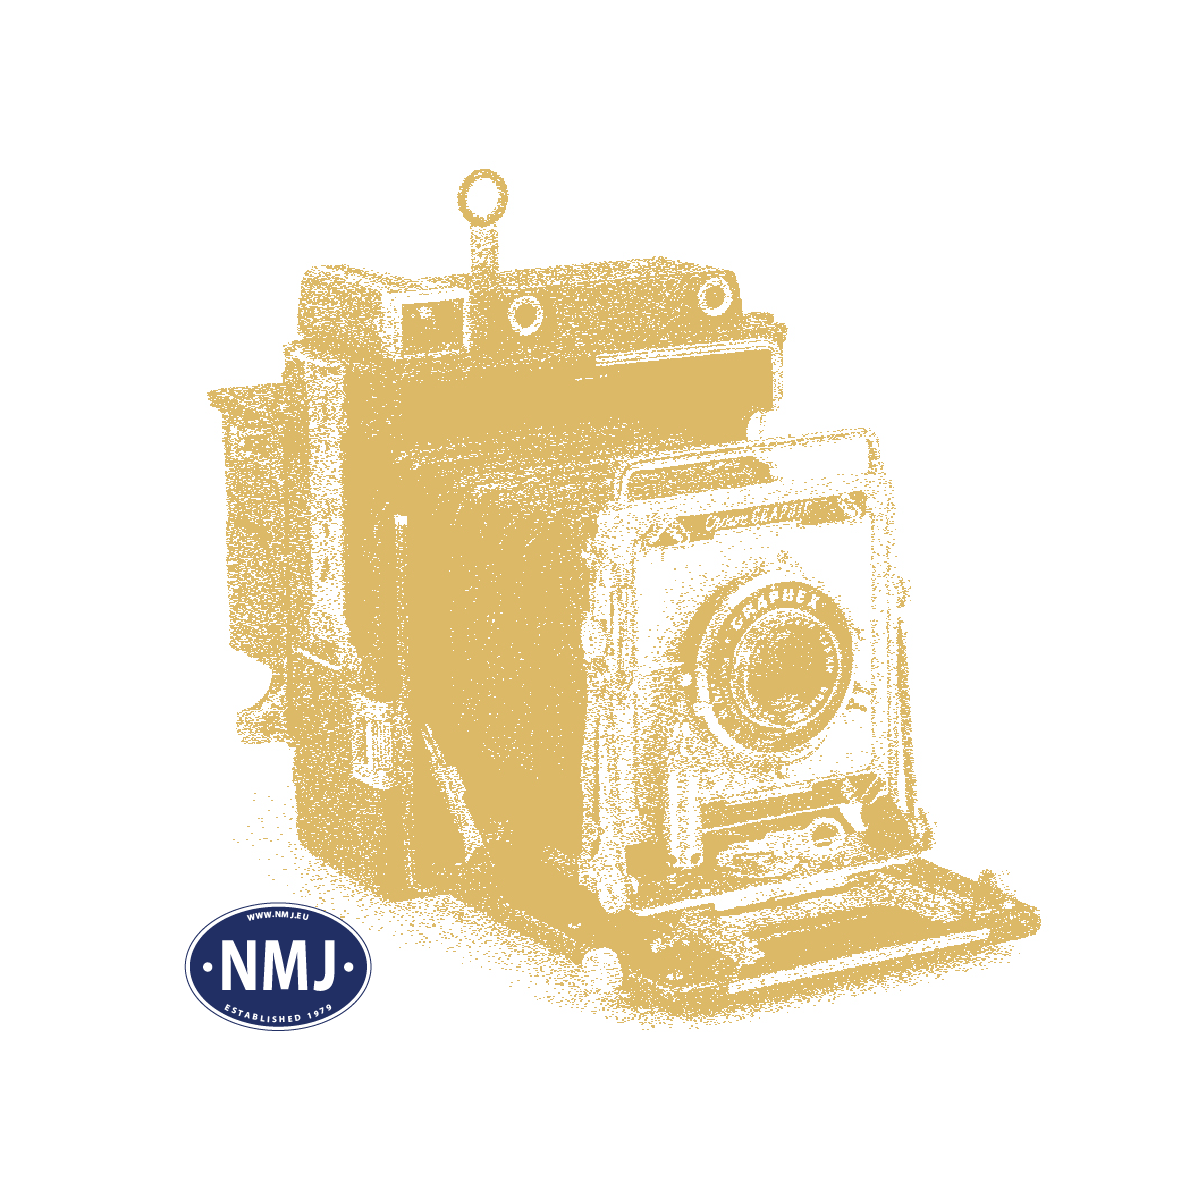 MBR55-1011 - Gressmatte #11, 30 x 40 Cm